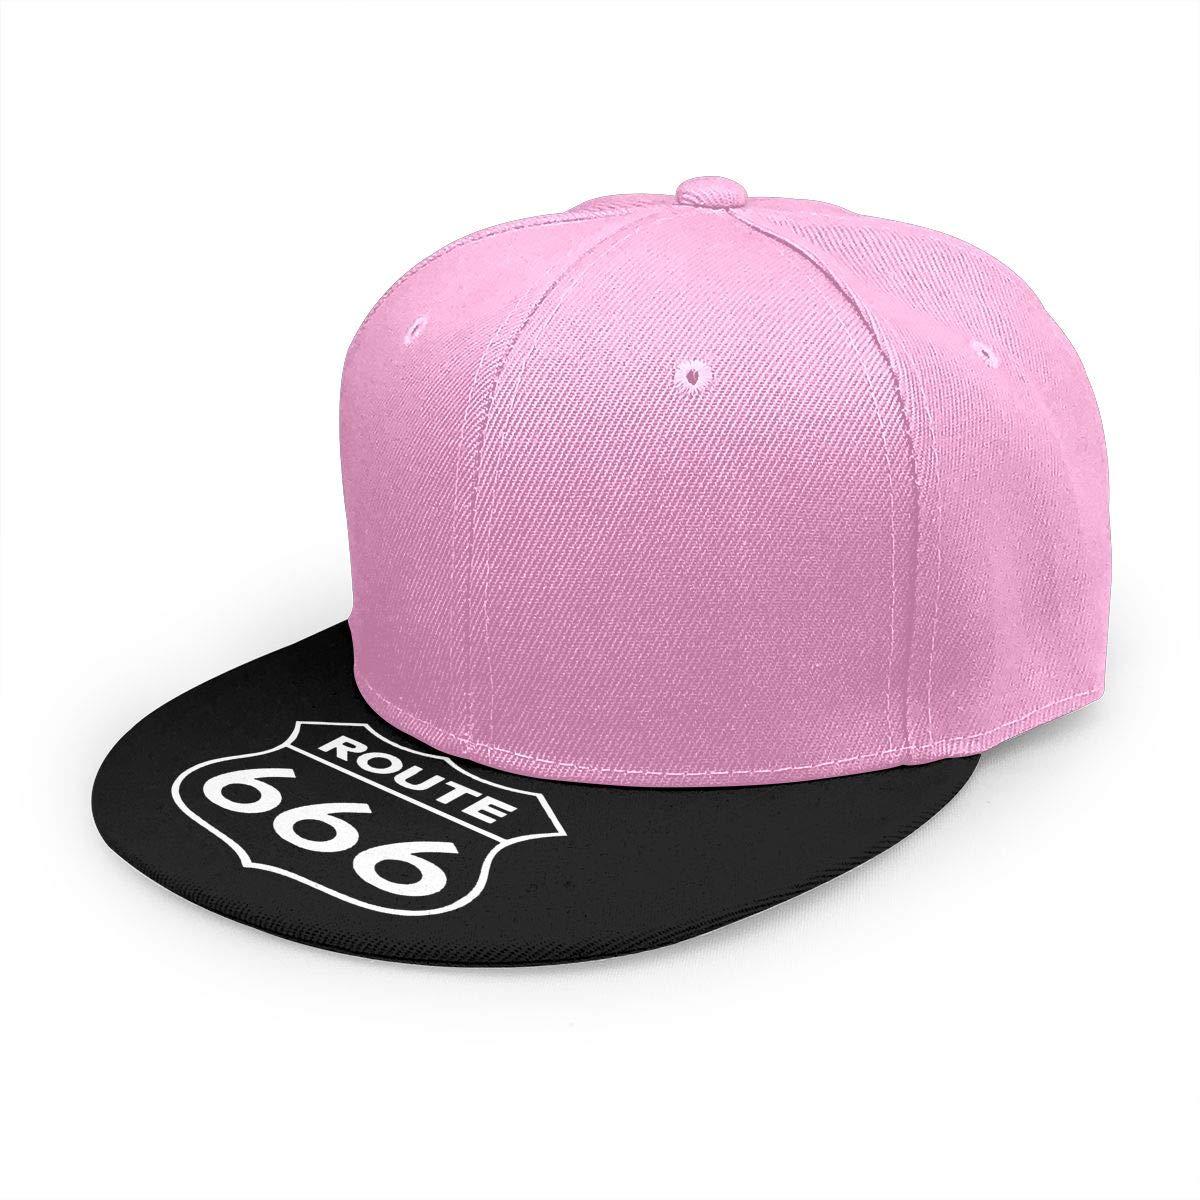 Adjustable Women Men Route 666 Print Baseball Cap Flat Brim Cap Hats Hip Hop Snapback Sun Hat Boys Girls Pink by Apolonia